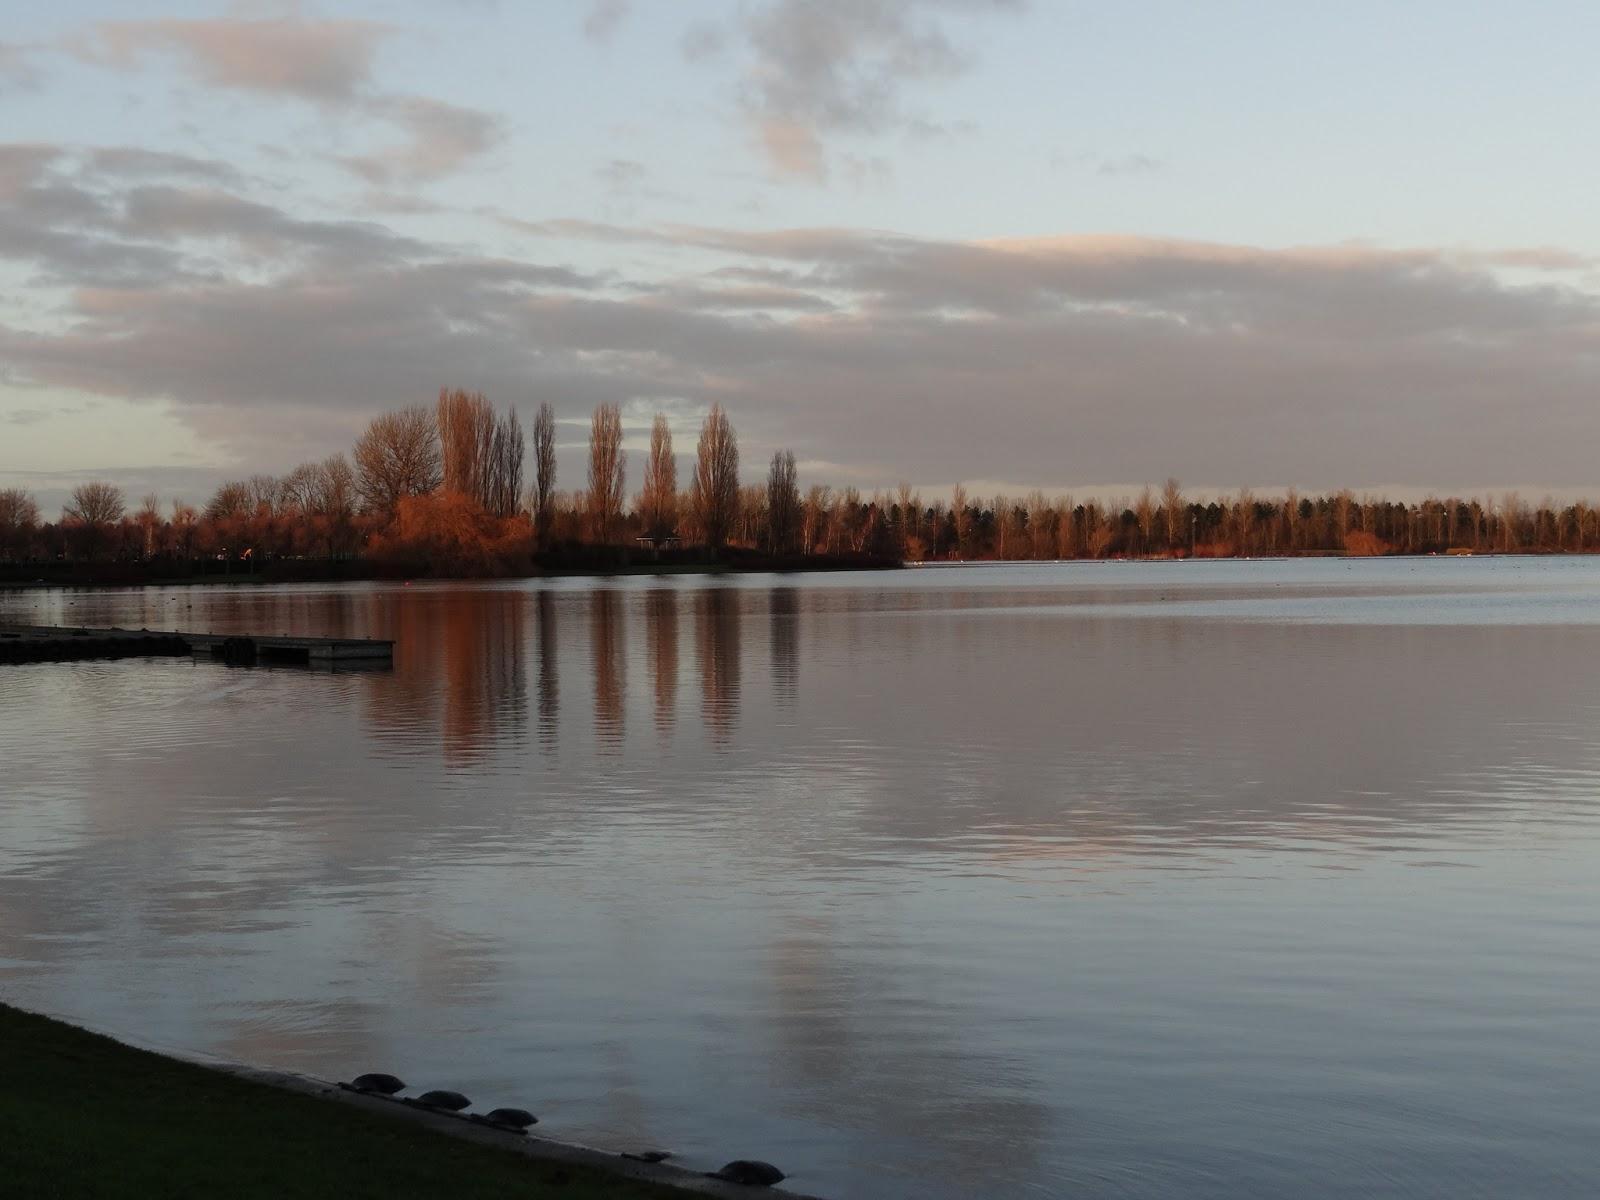 Willen South Lake